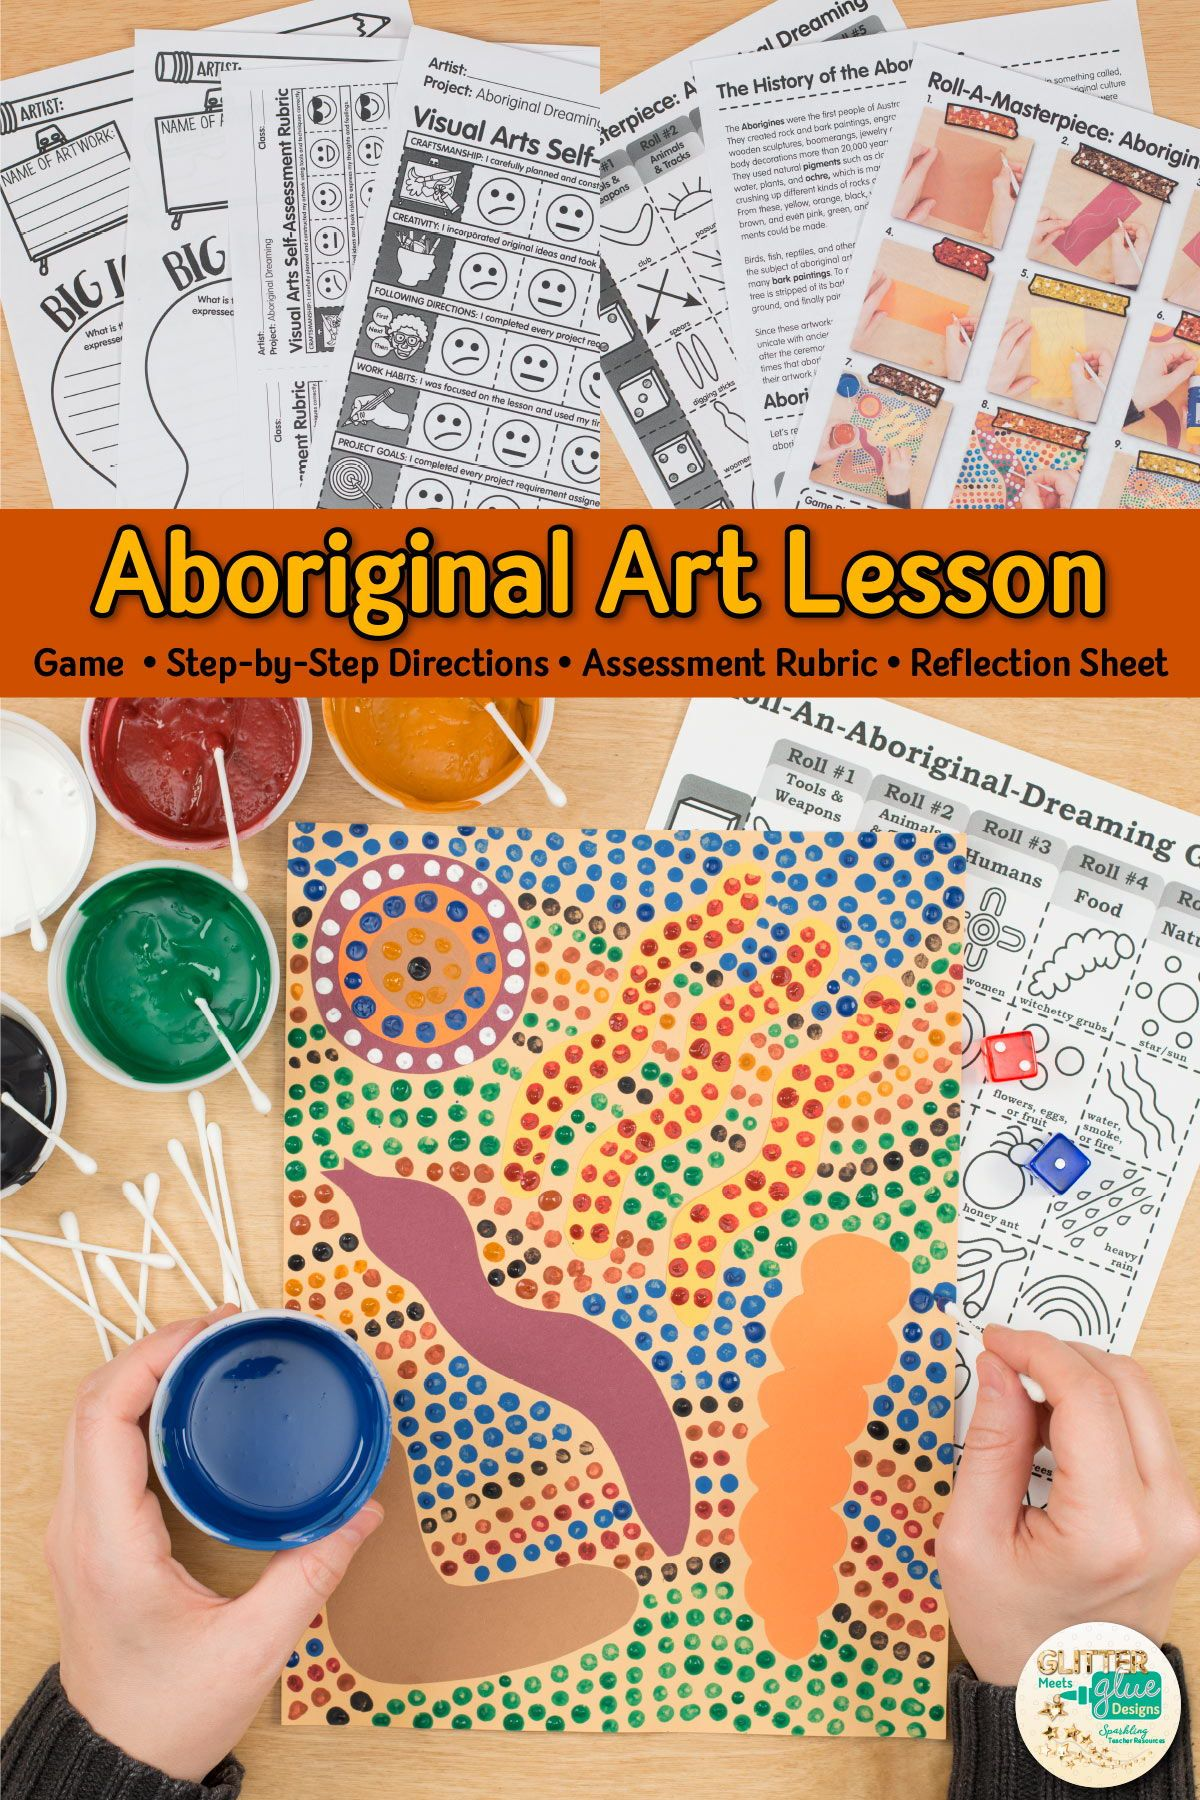 Aboriginal Art History Game